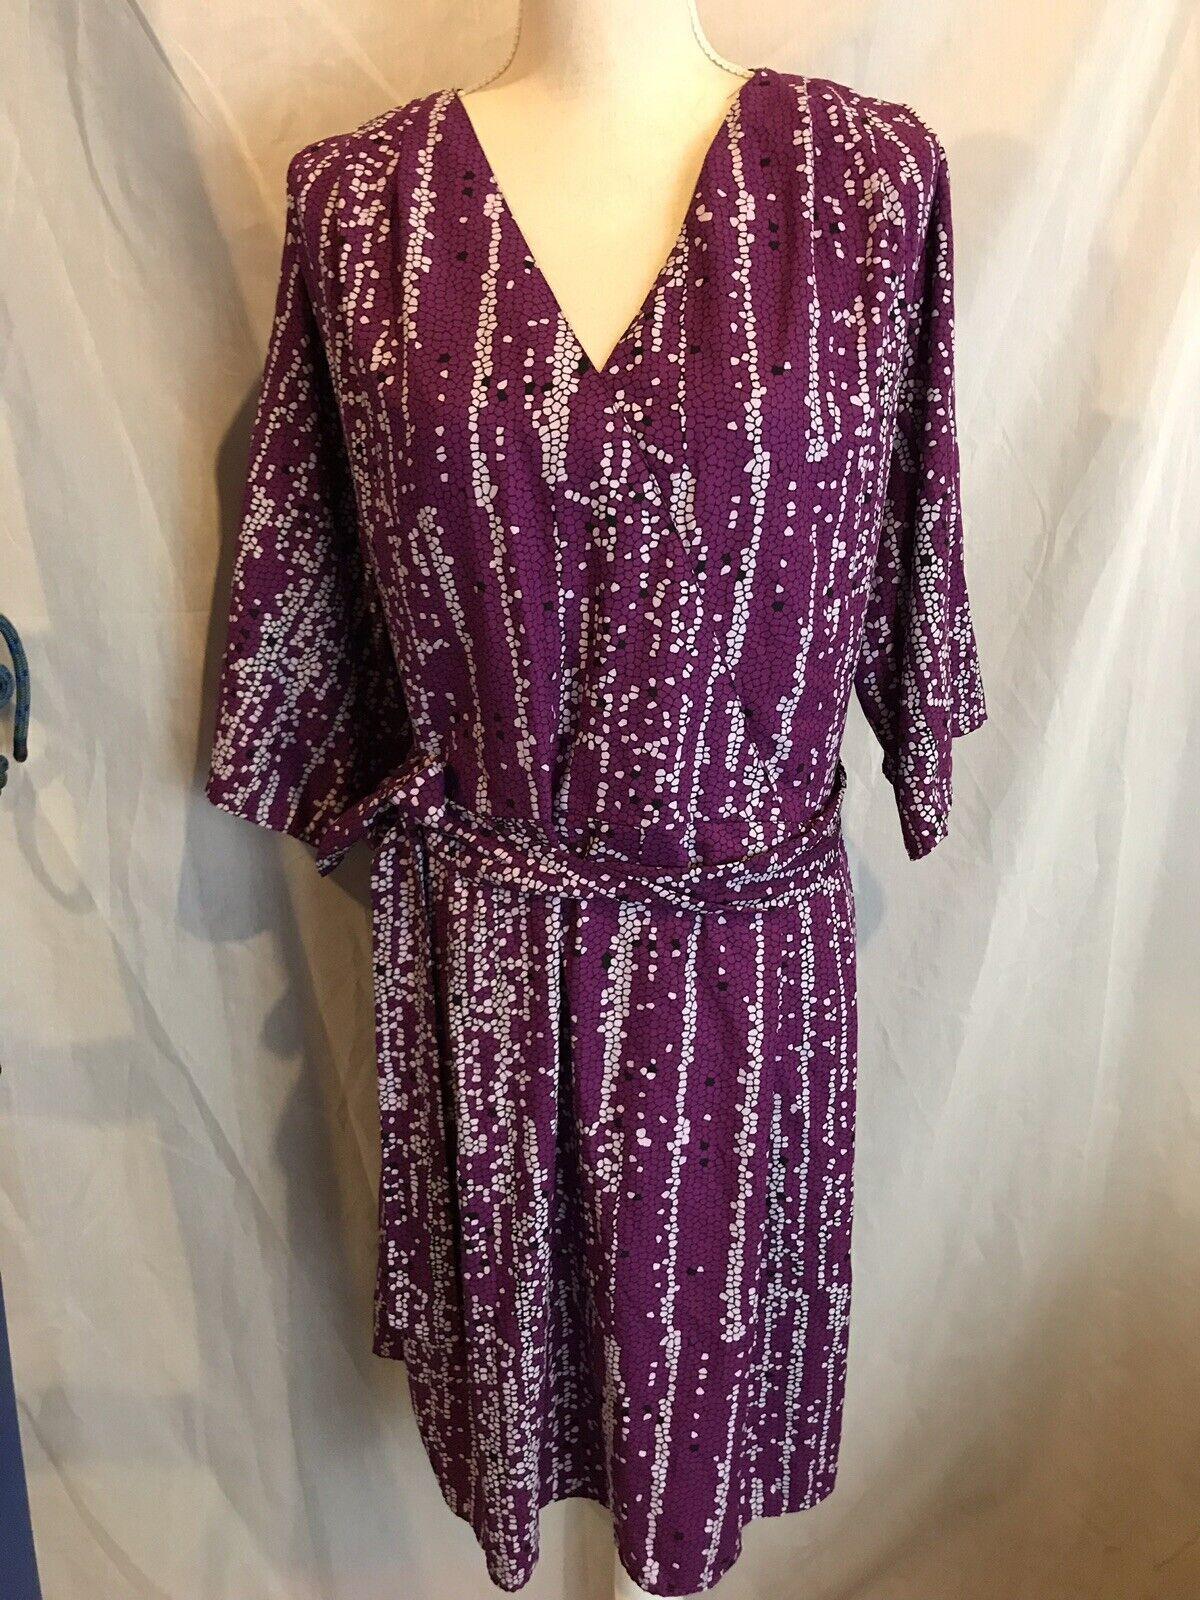 Mara Hoffman Gypsy Printed Faux Wrap Tie Waist Dolman Sleeve Rosa Tunic Dress 1X